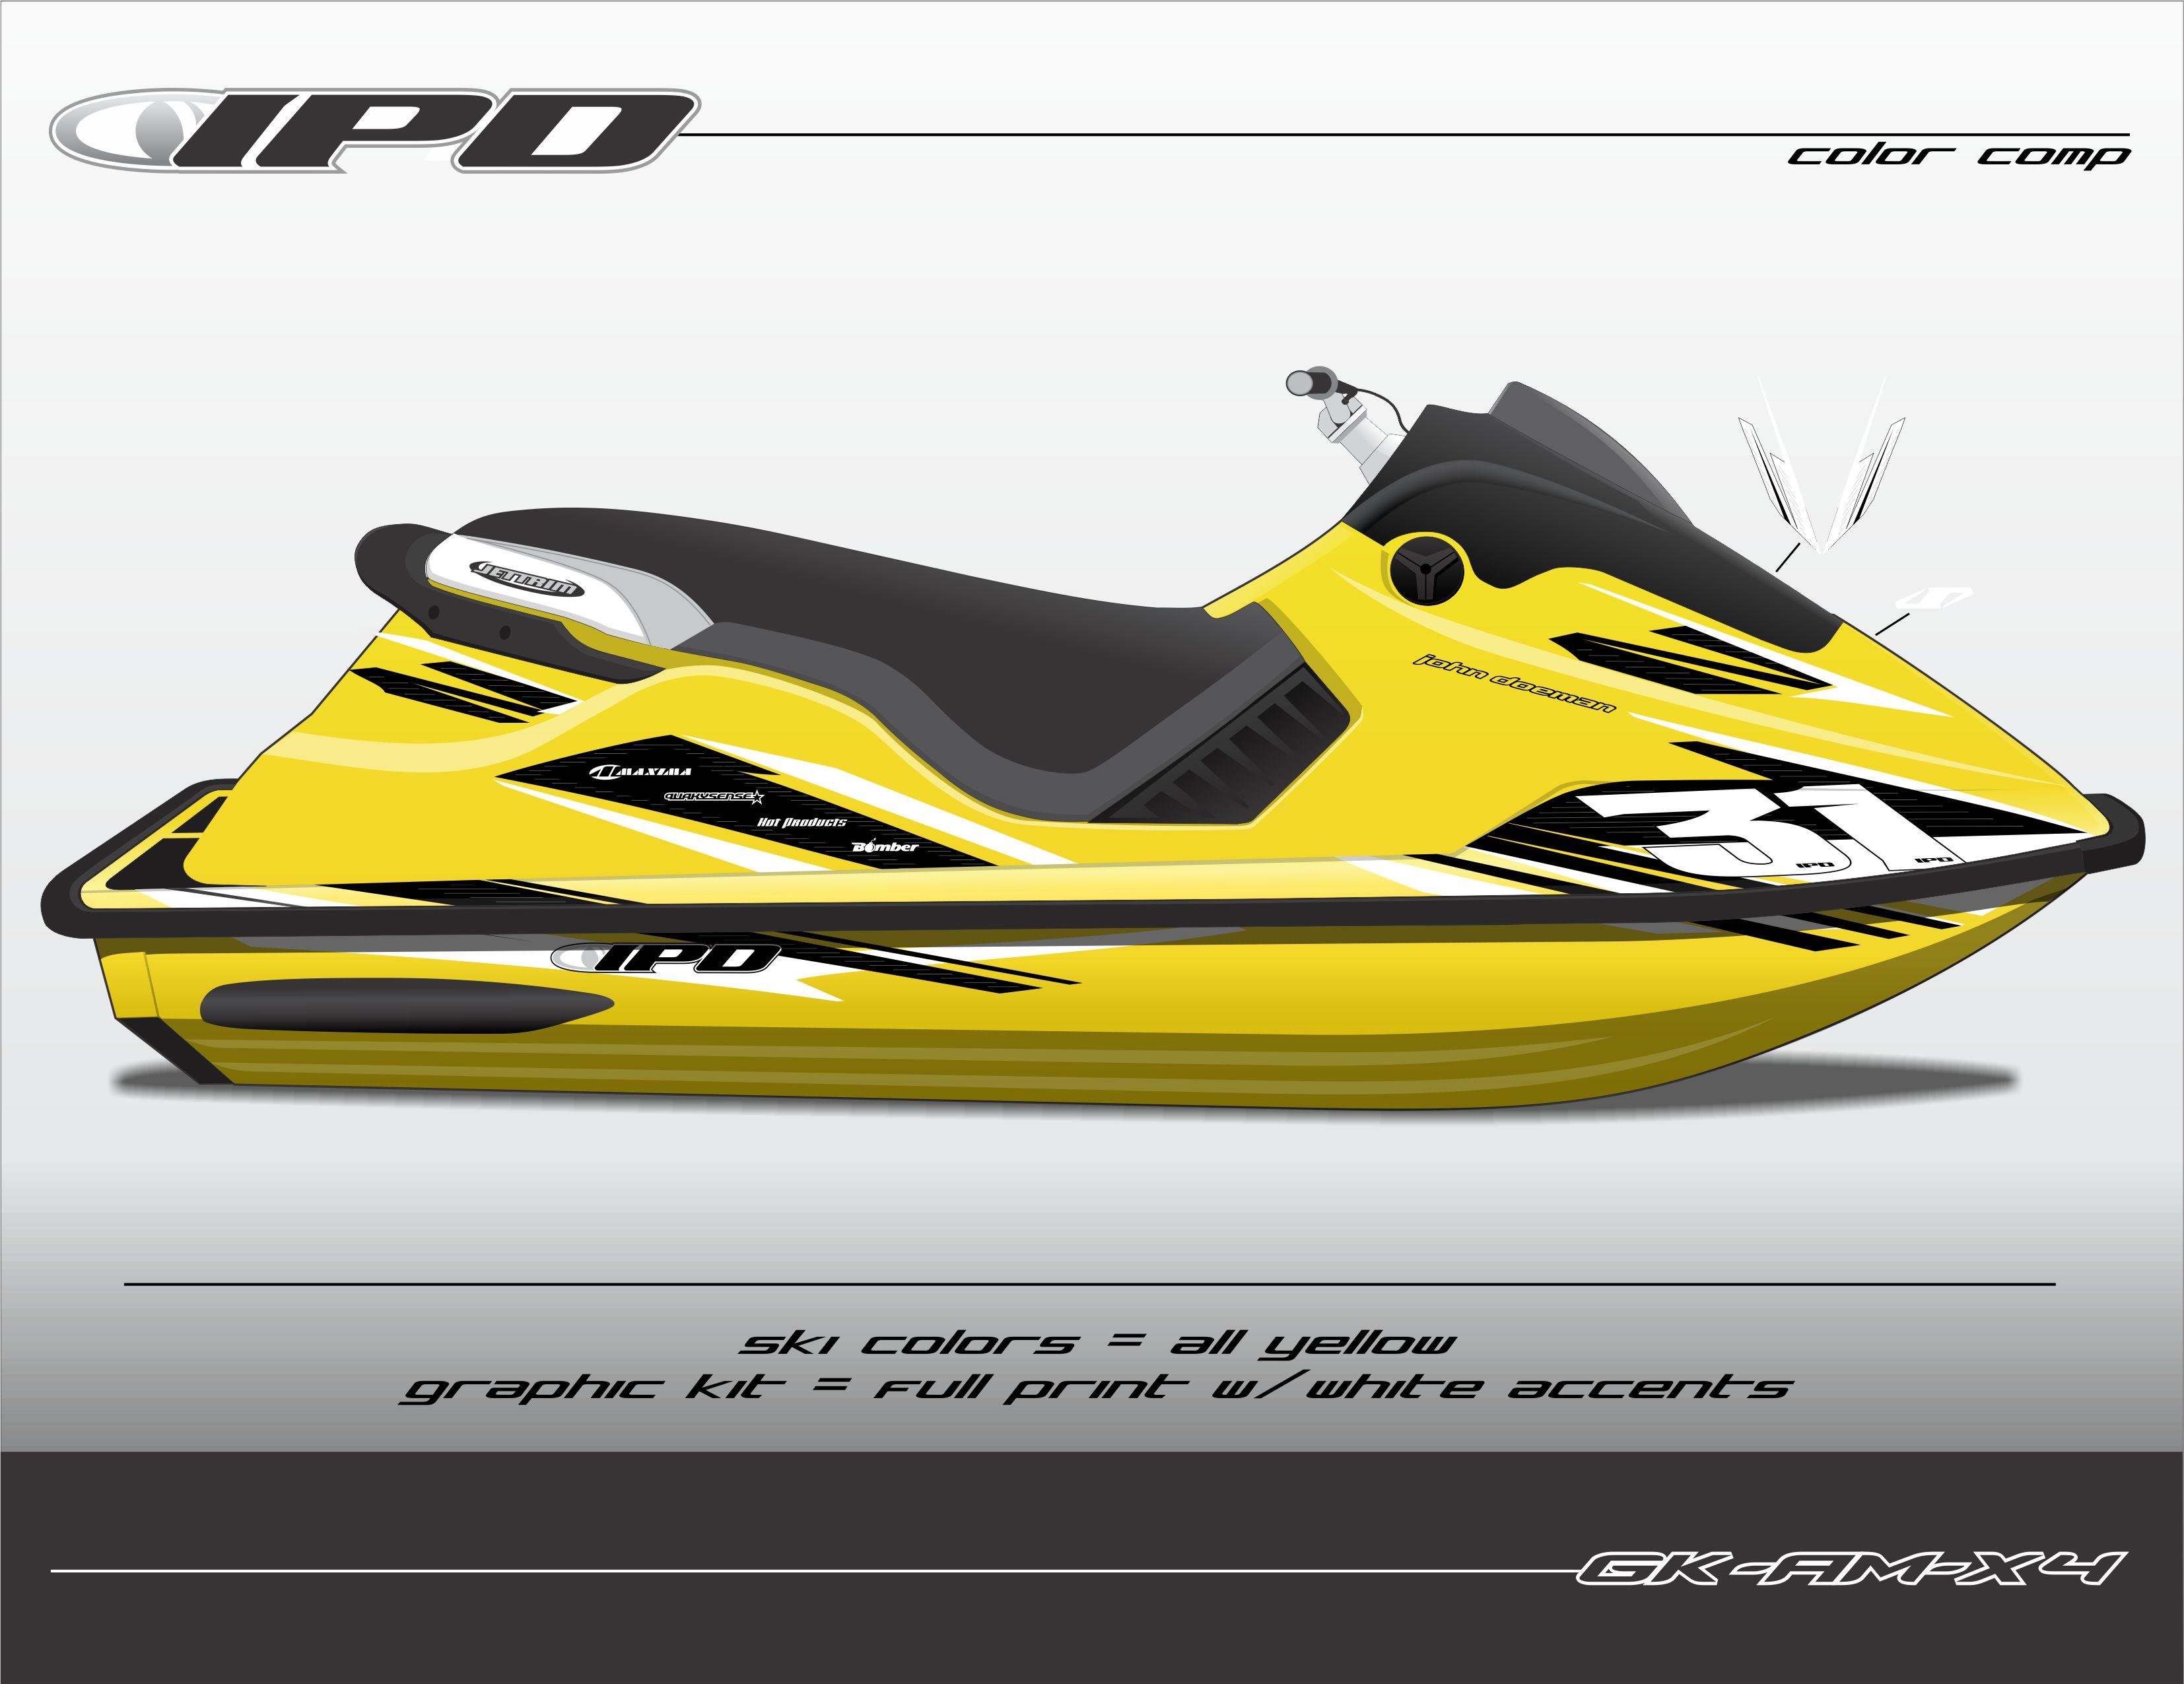 sea doo spx xp graphics kit am design ipd jet ski graphics. Black Bedroom Furniture Sets. Home Design Ideas